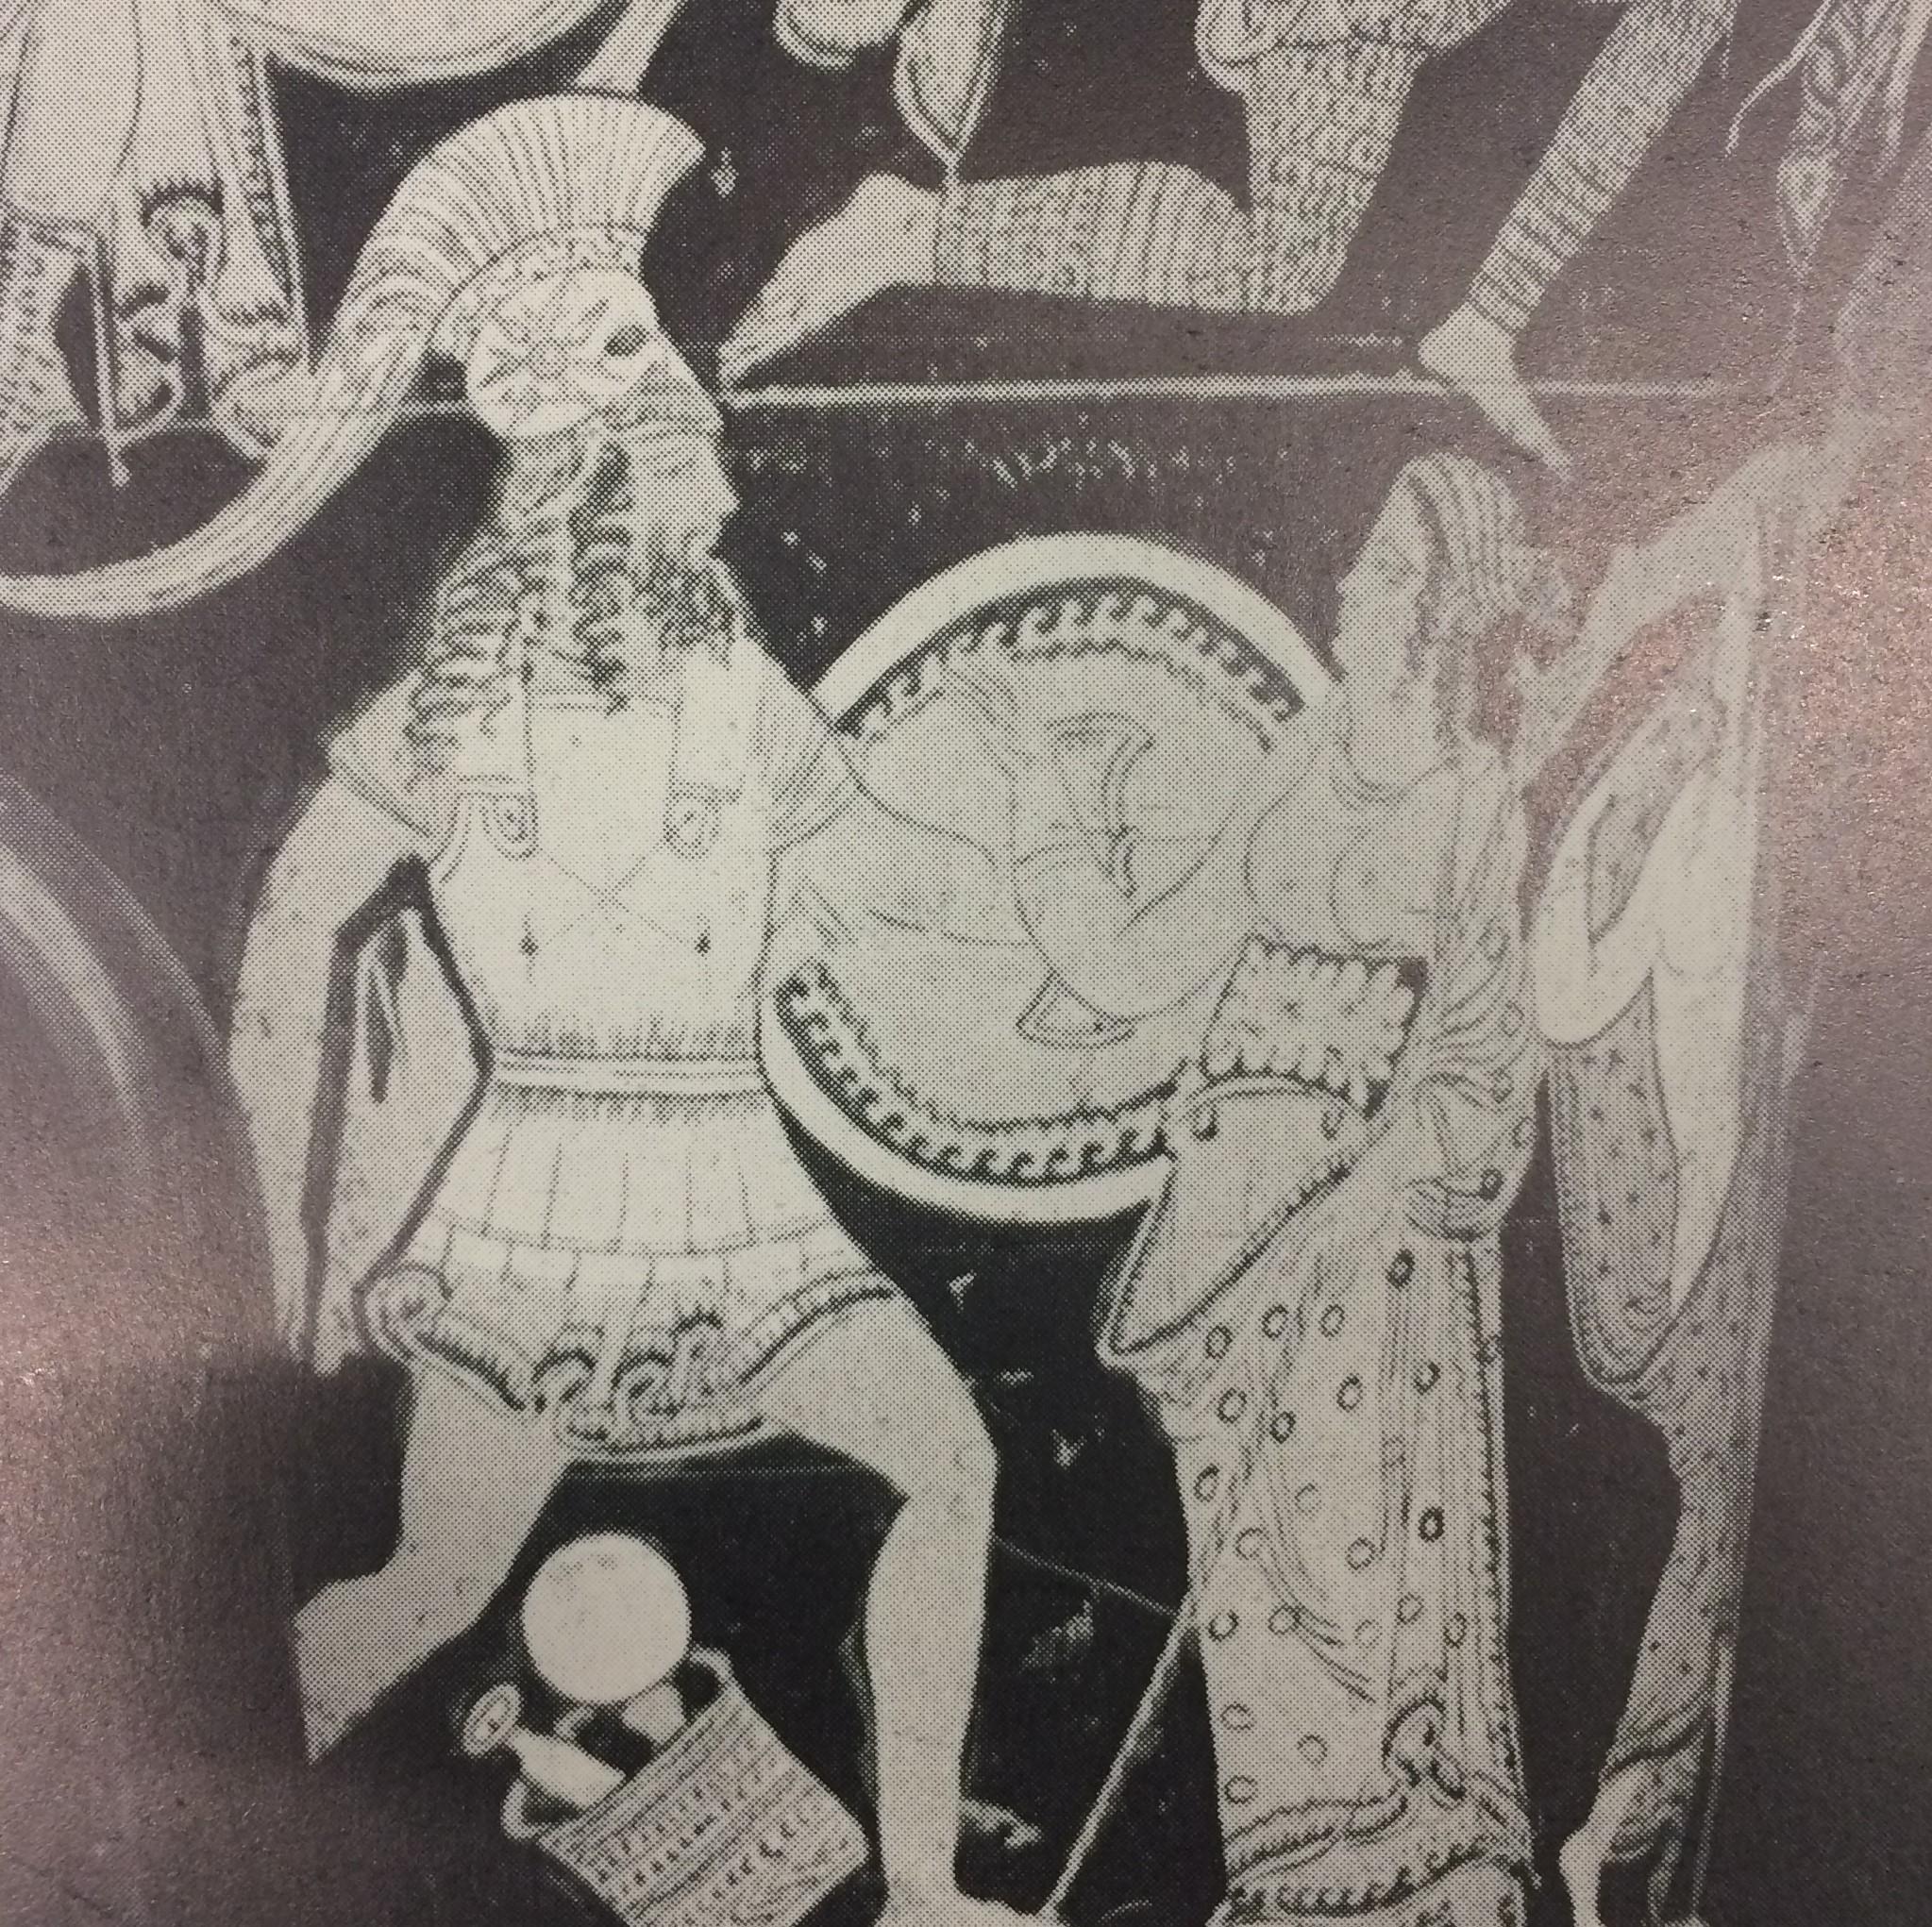 Abb. 9: British Museum London, 380-360 v. Chr.